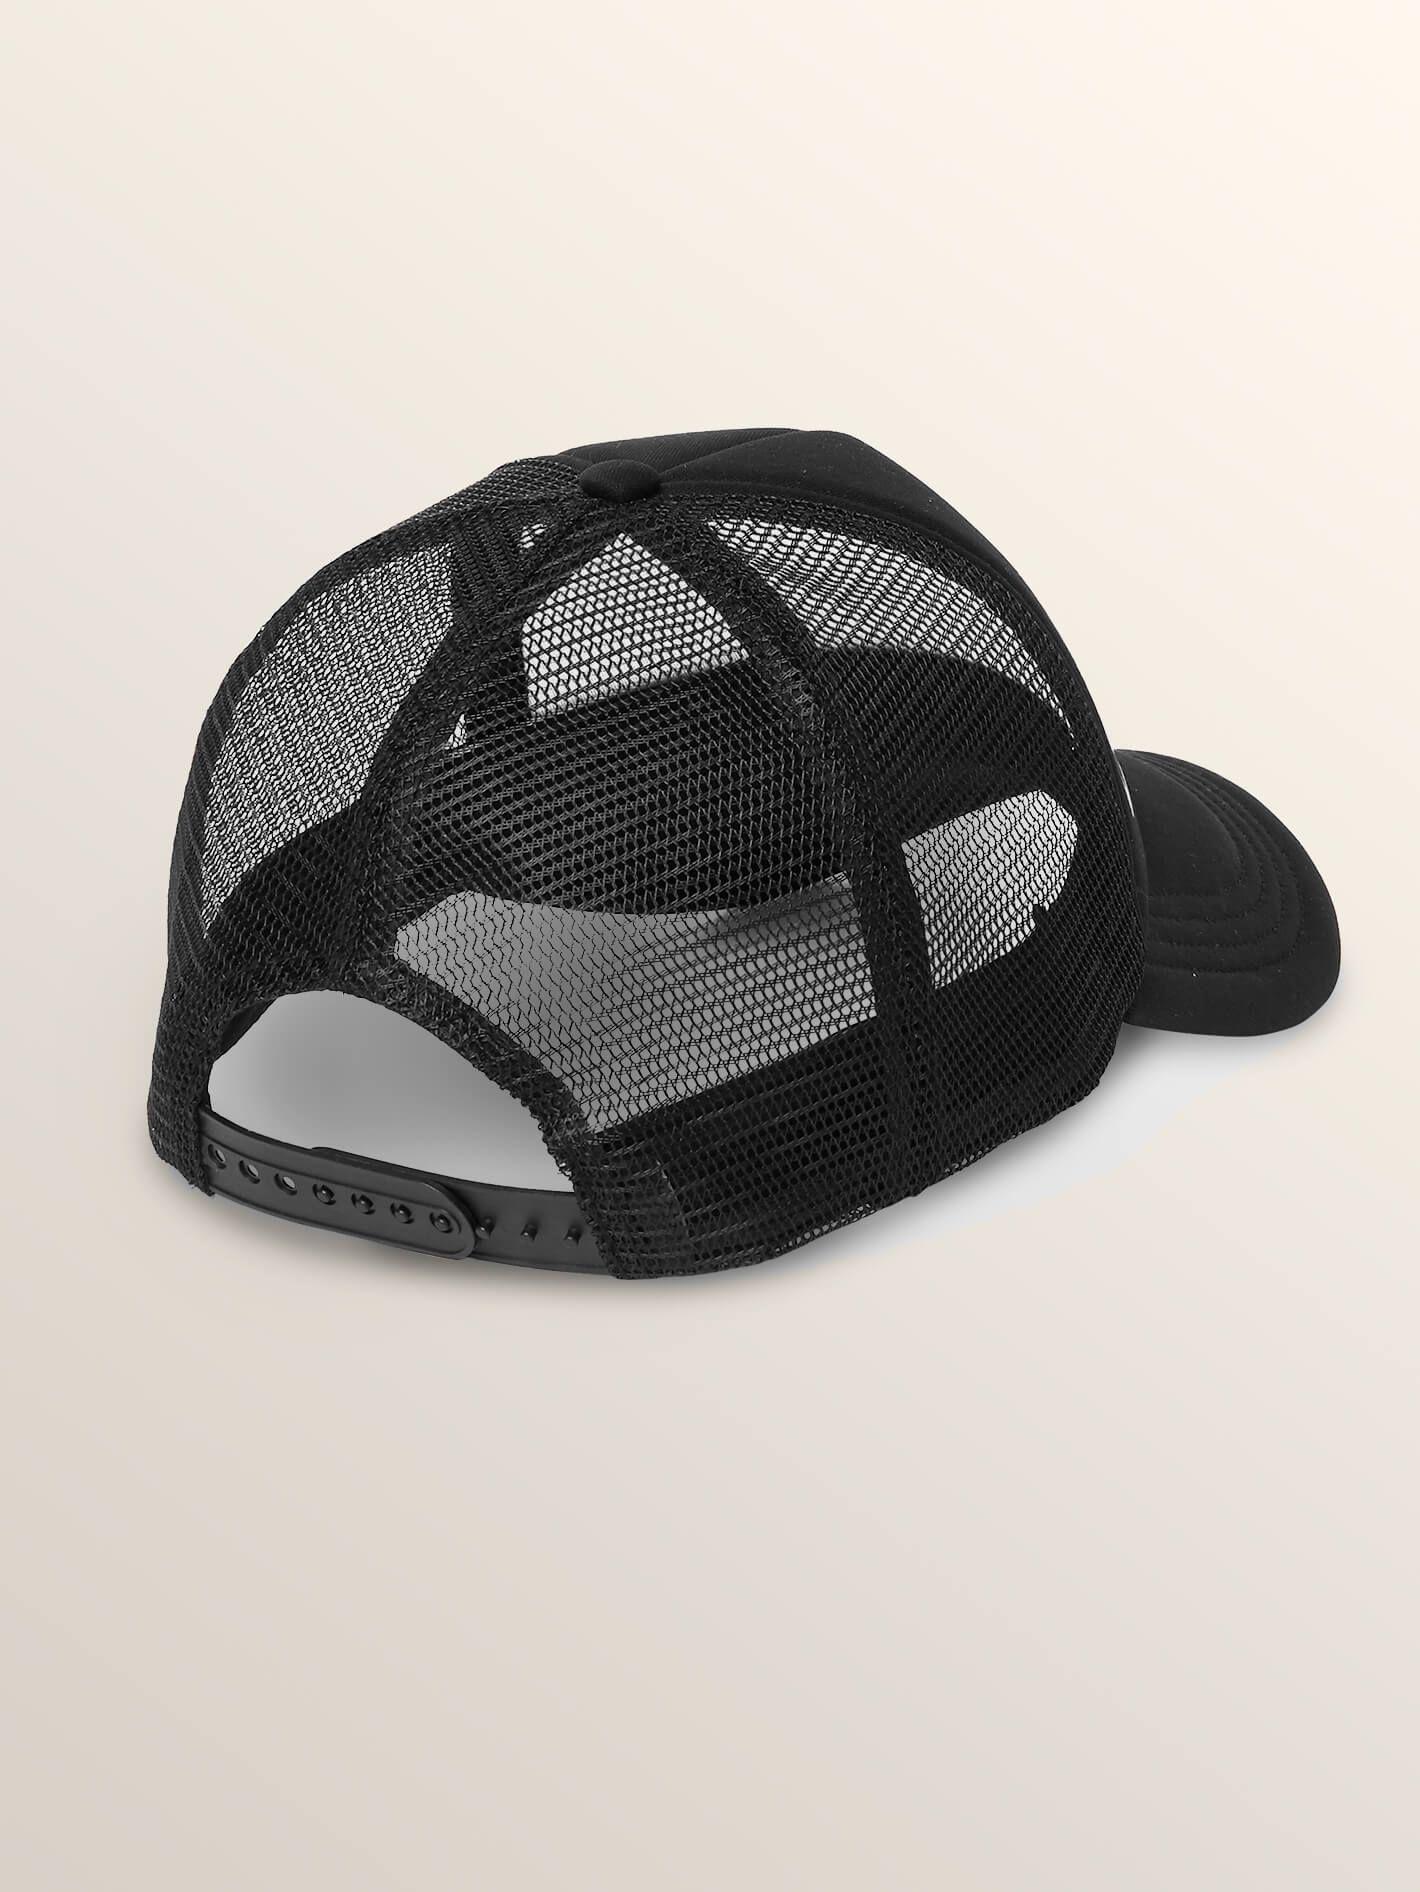 154b10ff381 ... australia lyst volcom cali stoned trucker hat black o s in black for  men 51ca6 61fdc